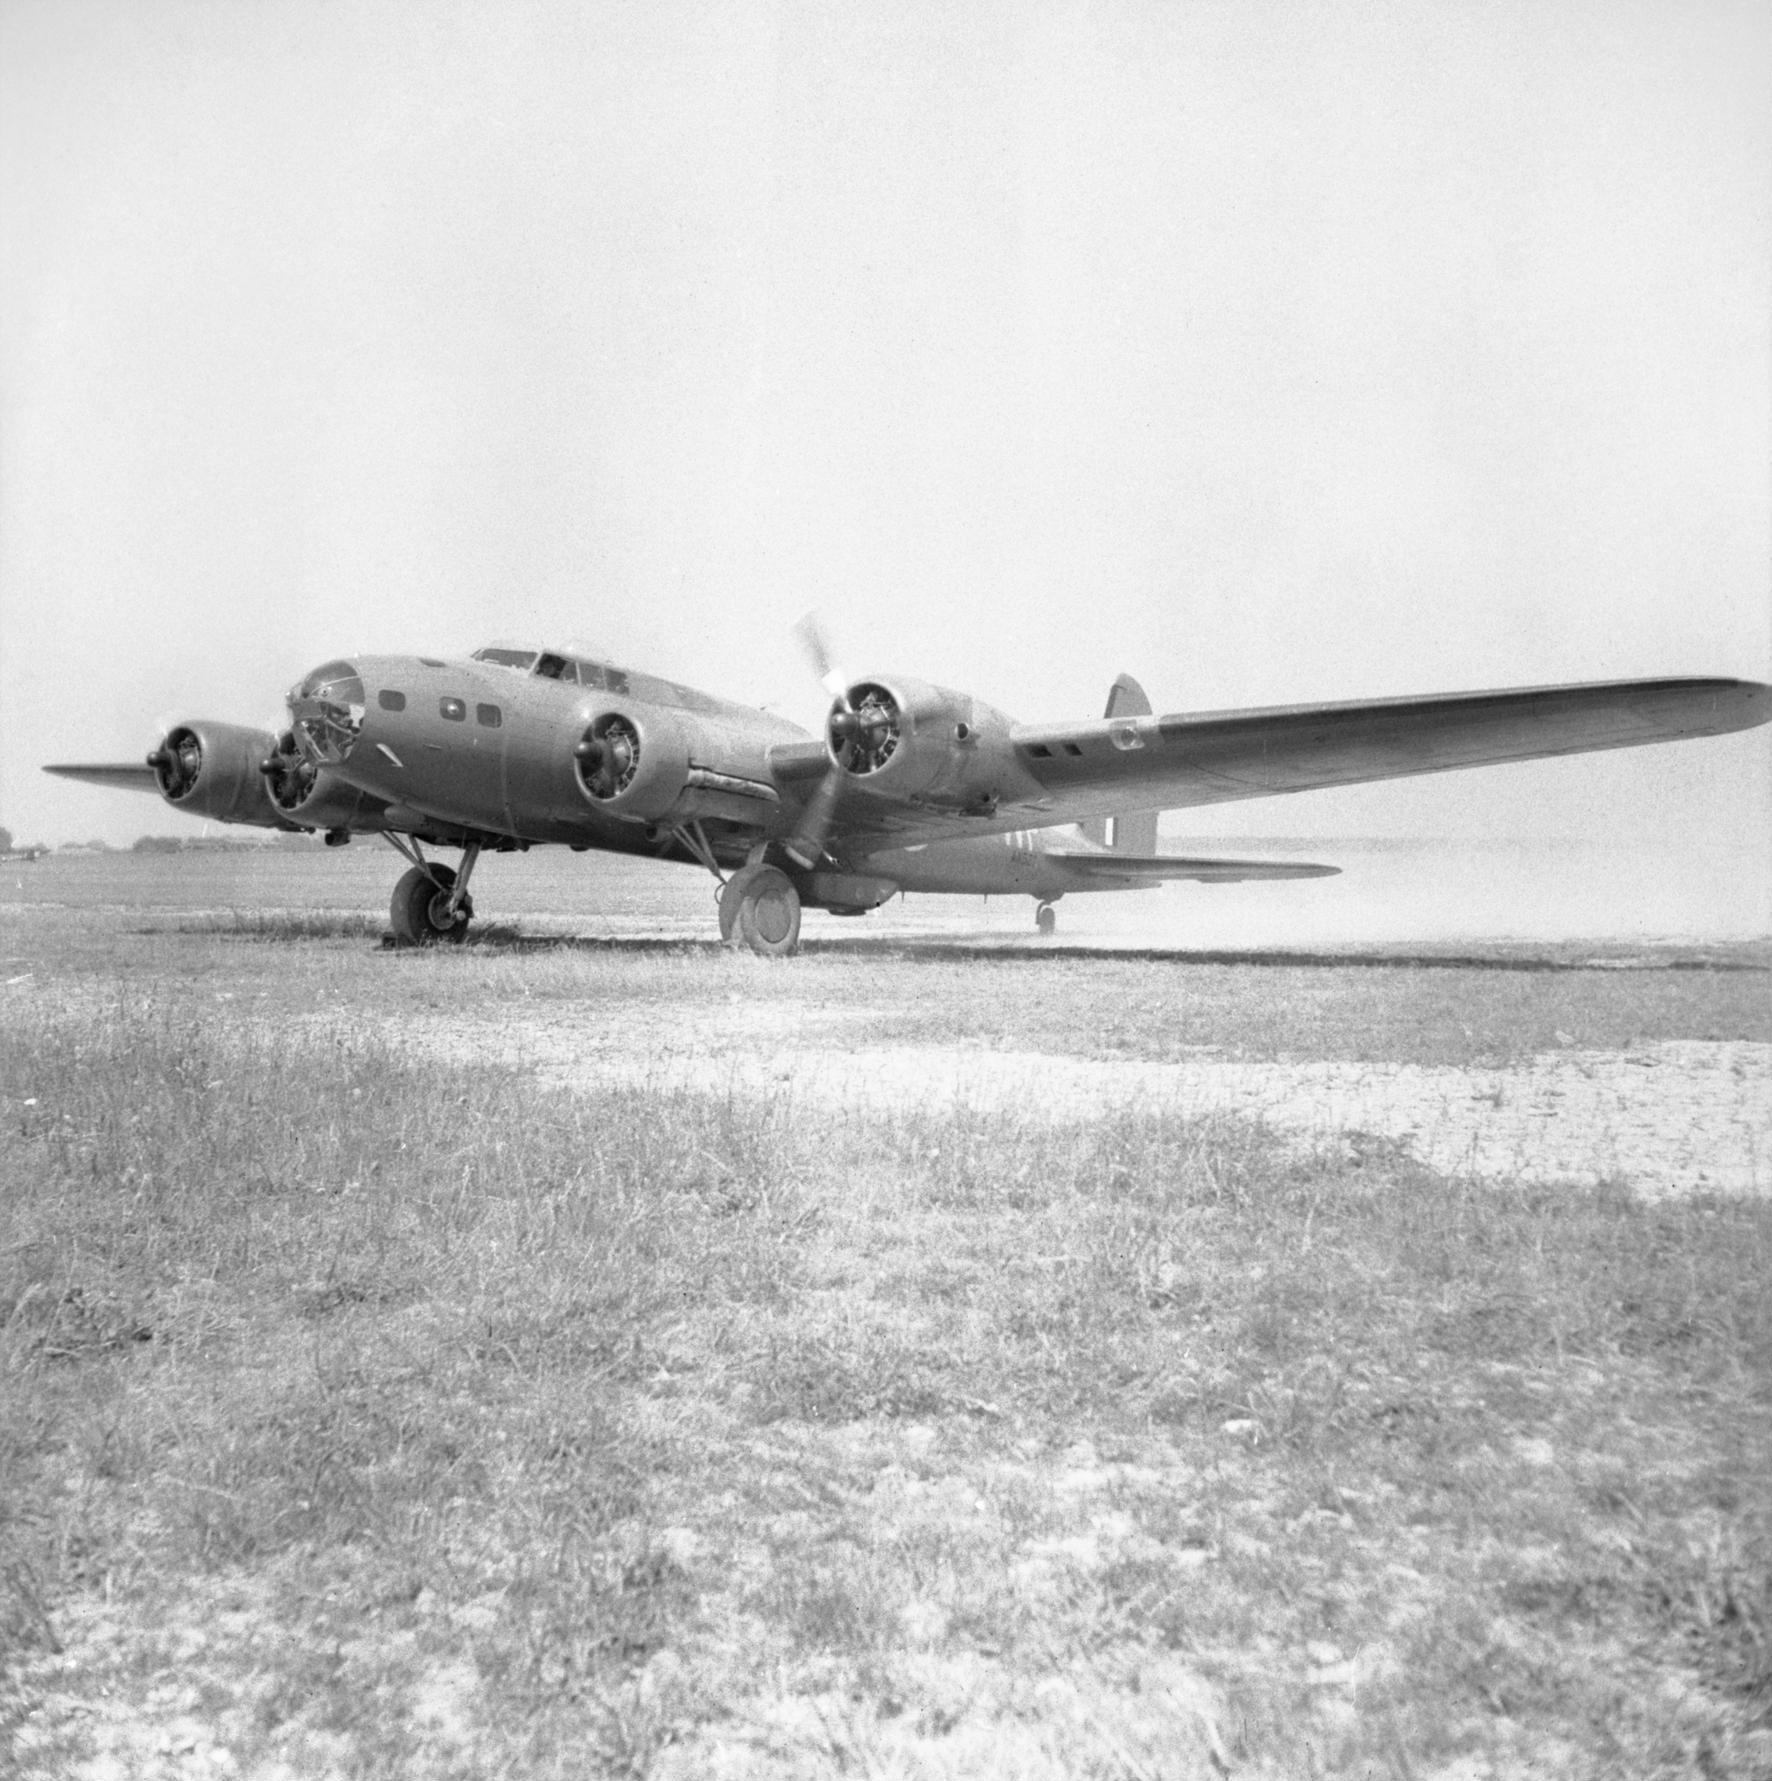 No. 597 Squadron RAF